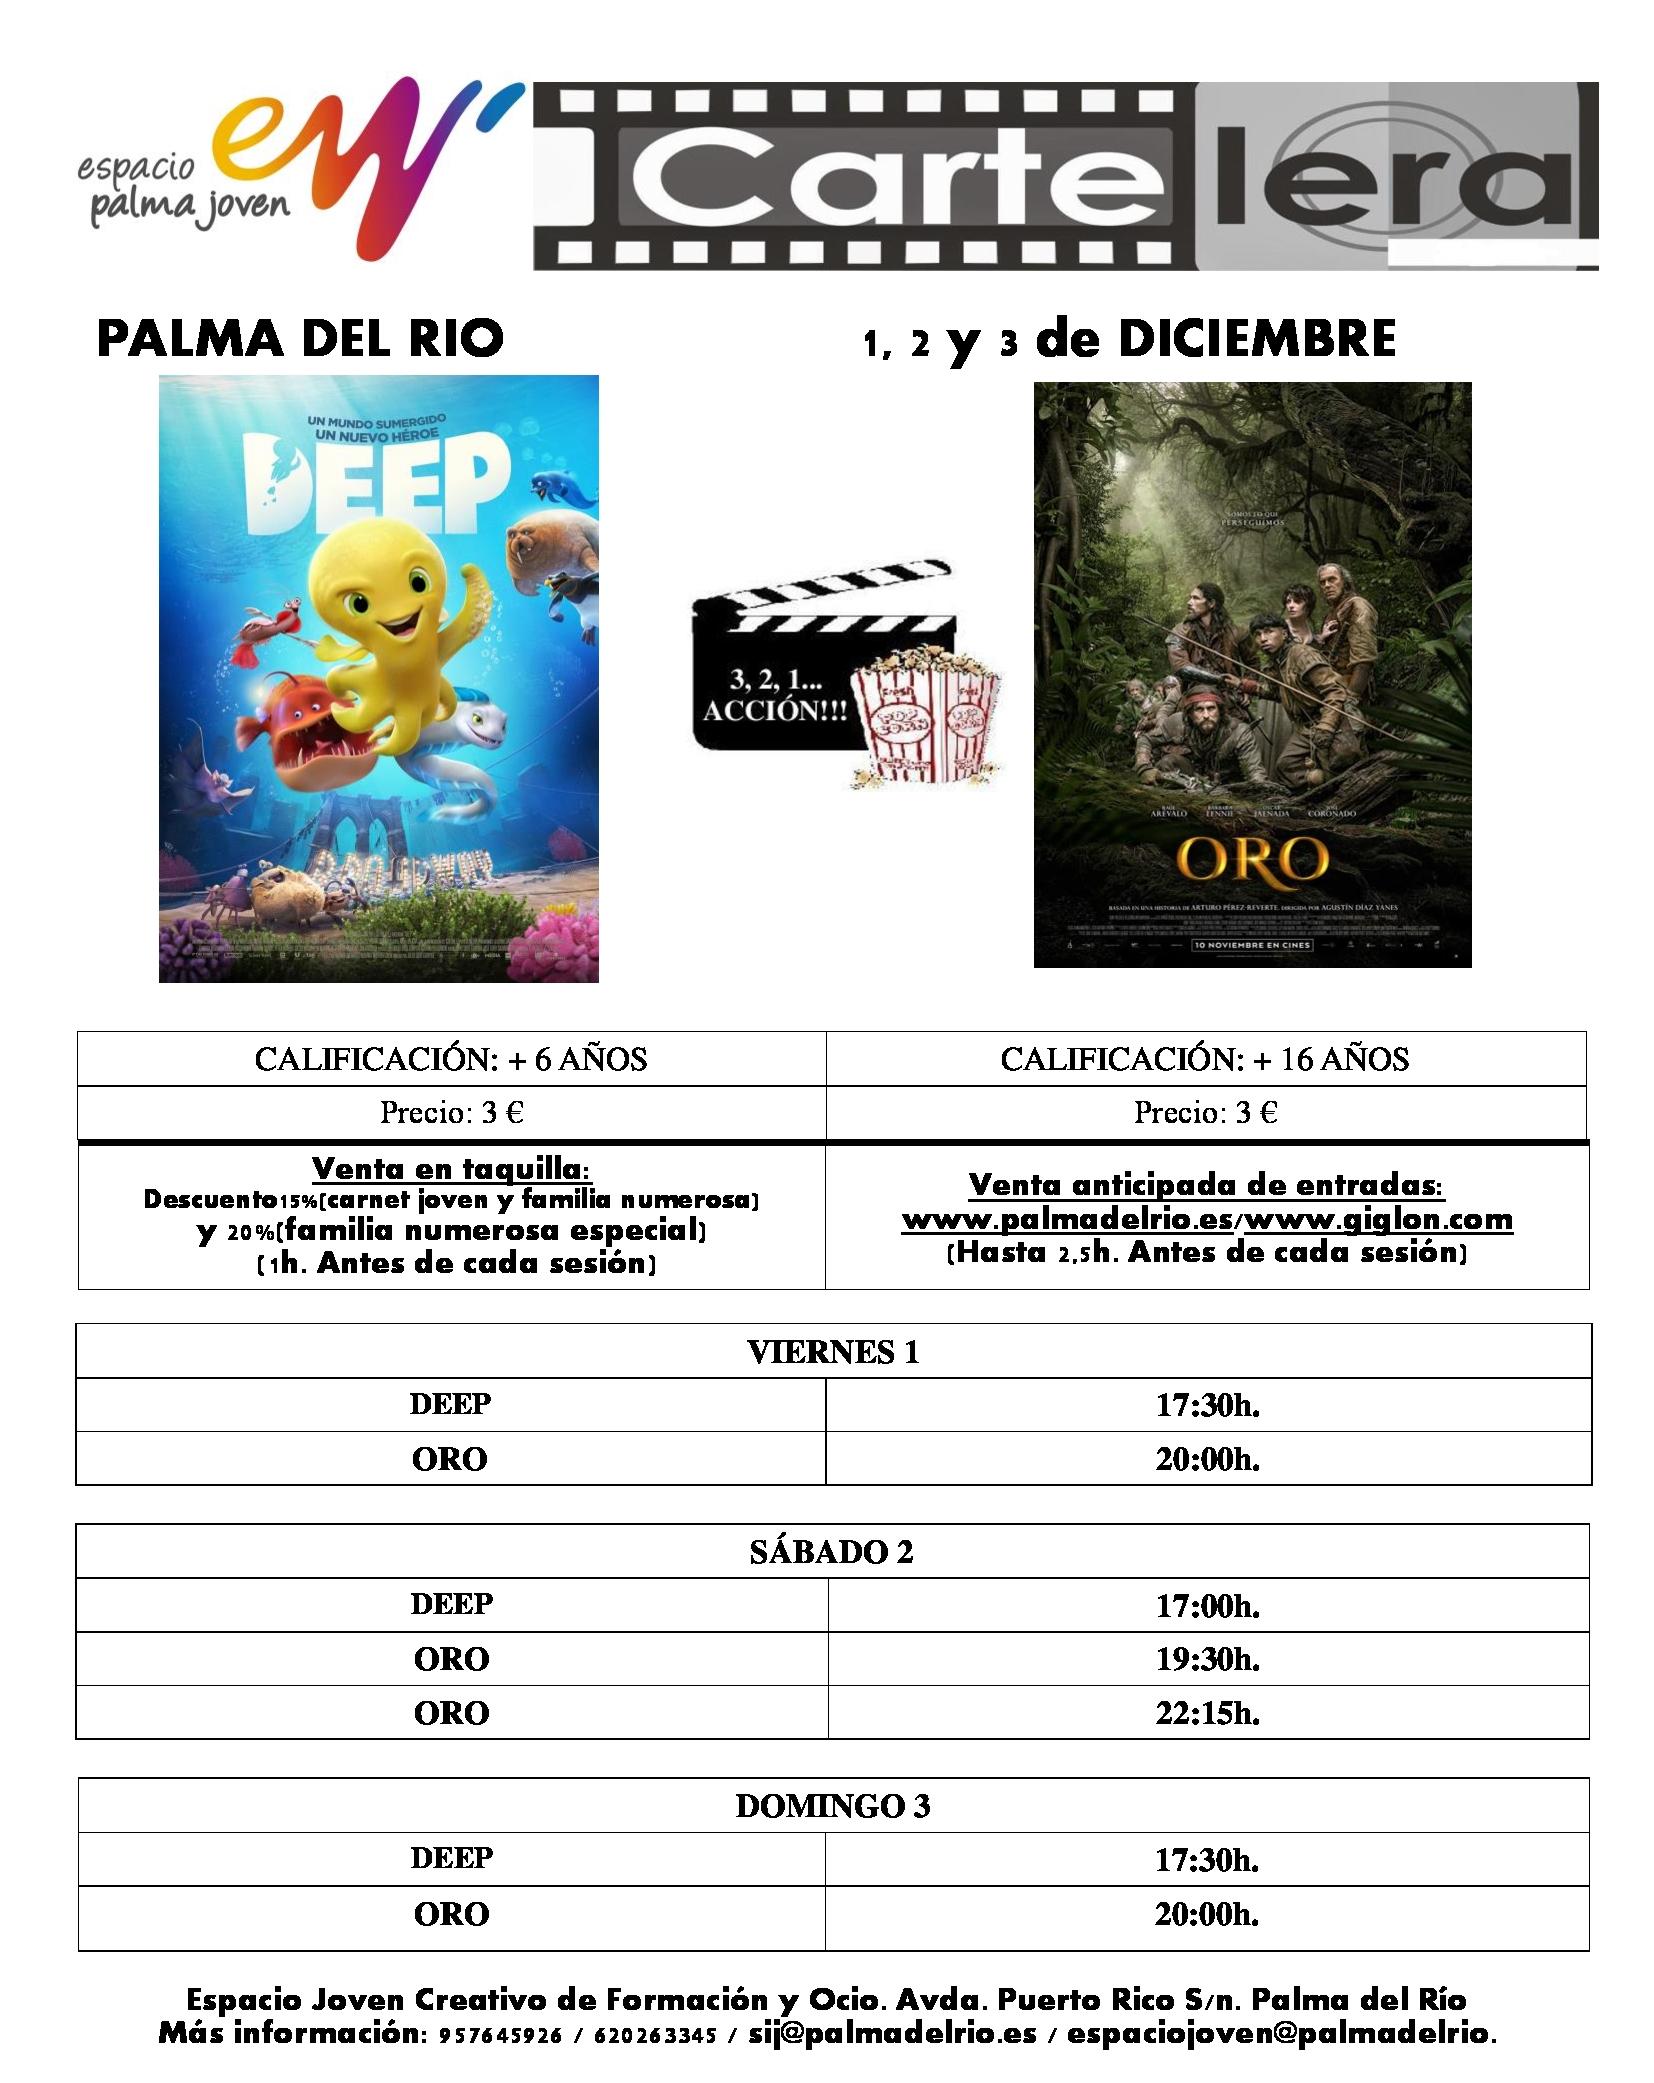 https://www.palmadelrio.es/sites/default/files/cartelera_1.2.3_diciembre_2017.jpg